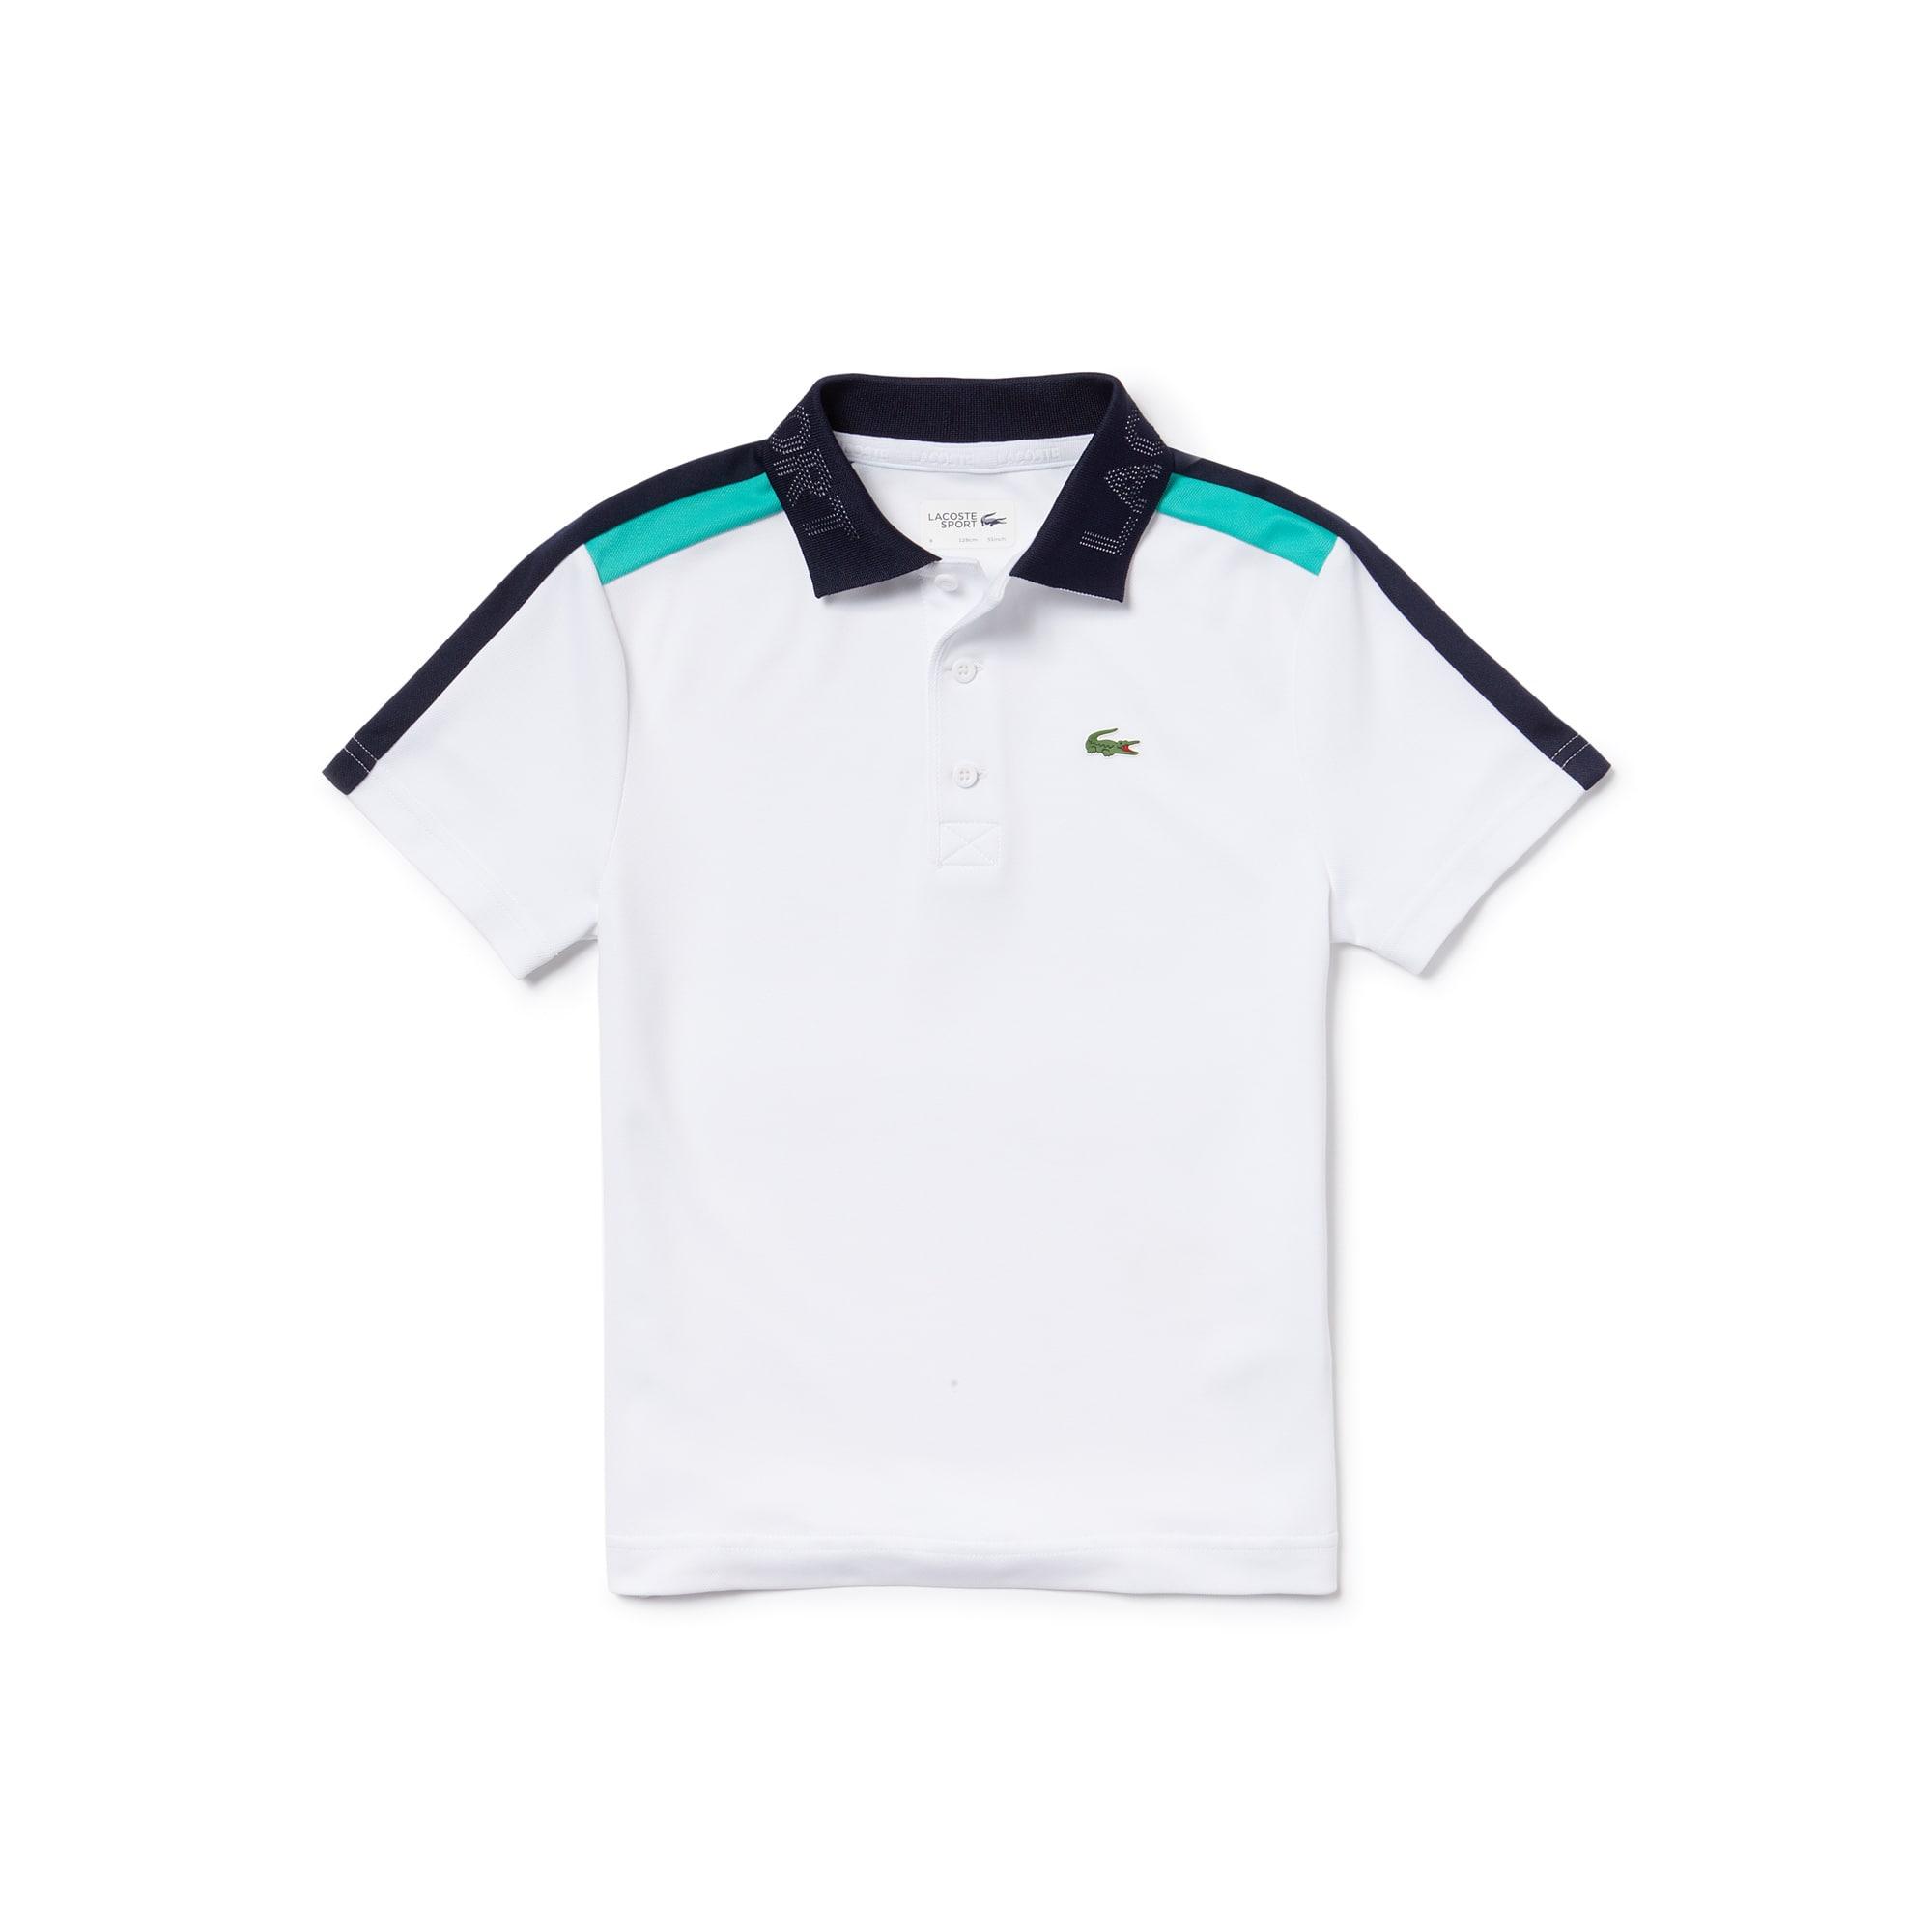 Boys' Lacoste SPORT Contrast Bands Piqué Tennis Polo